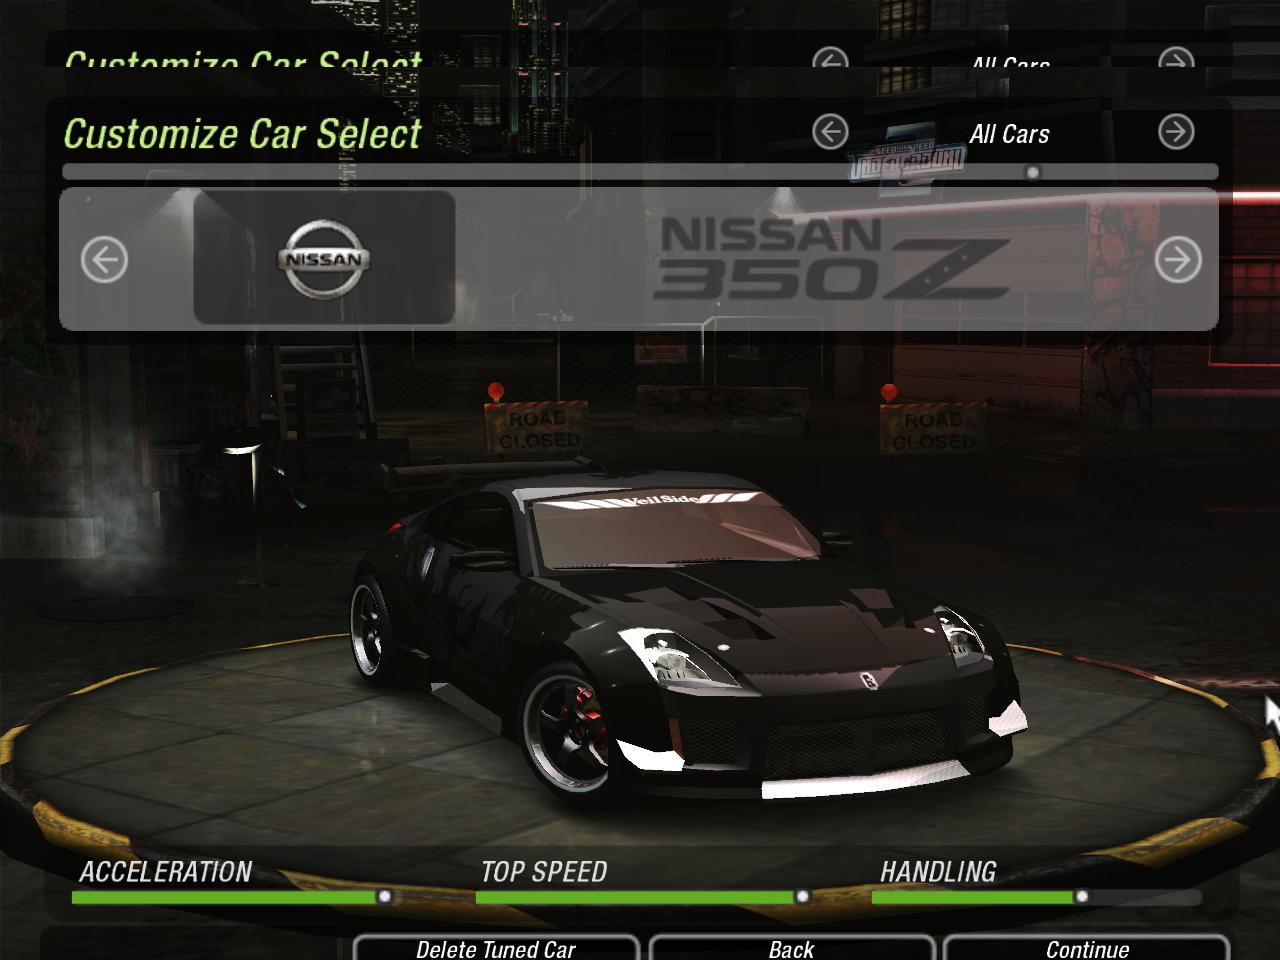 ... Nissan 350Z Tokyo Drift. Votes